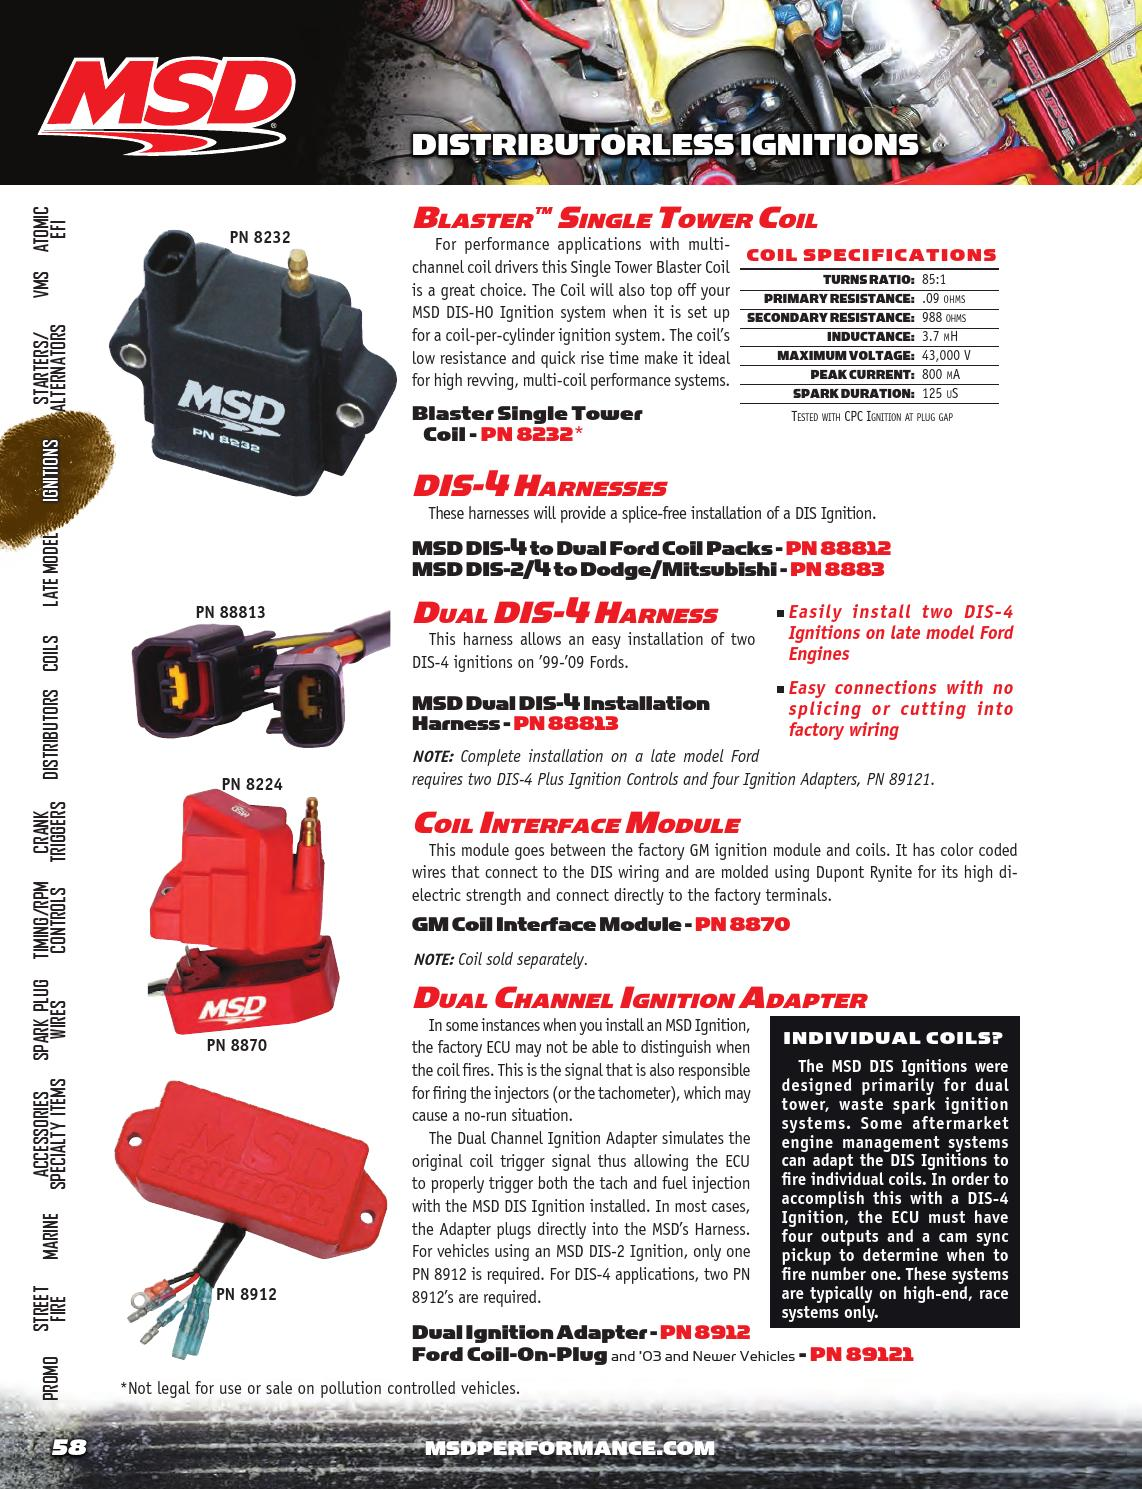 2014 Msd Catalog By Tmeyer Inc Issuu Engine Wiring Harness